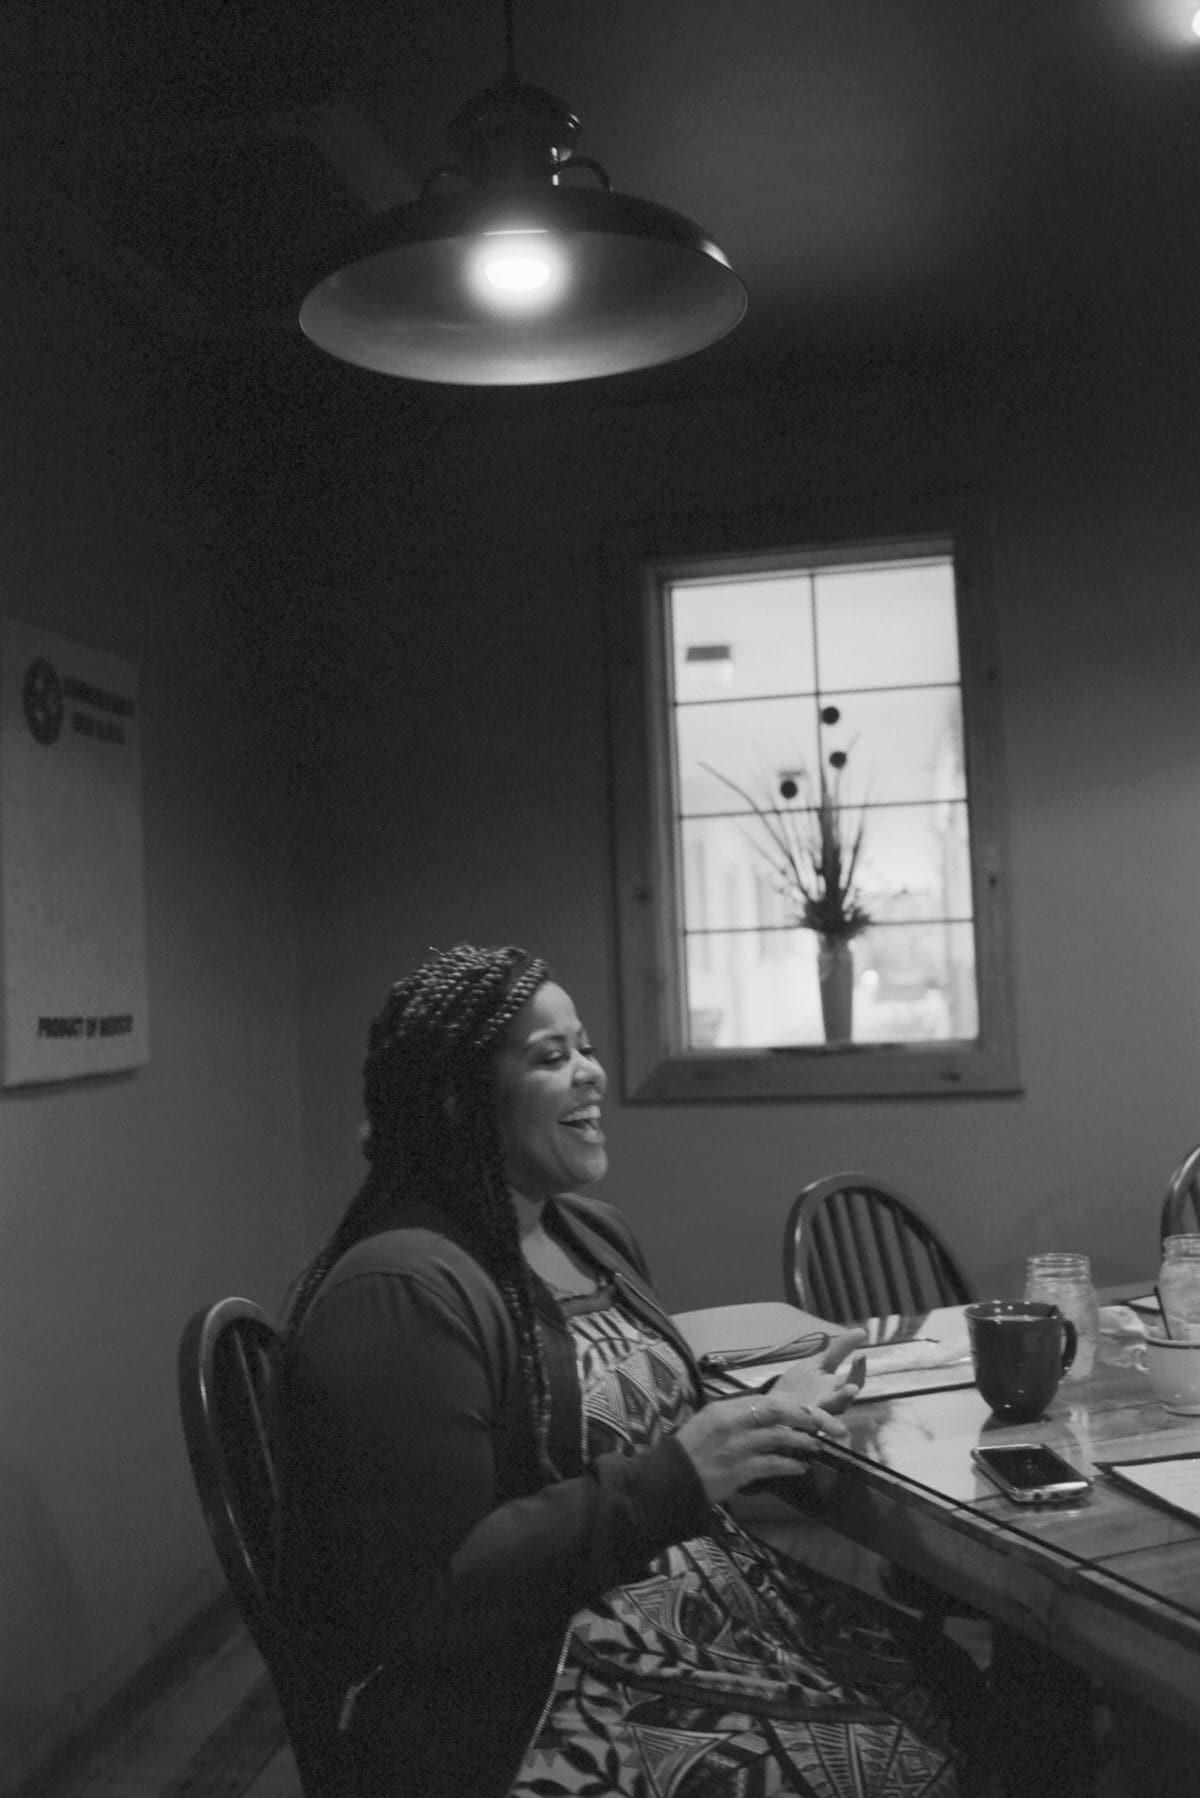 Illuminating-Women-art-exhibition-black-and-white-fine-art-film-photography-by-Studio-L-photographer-Laura-Schneider-033